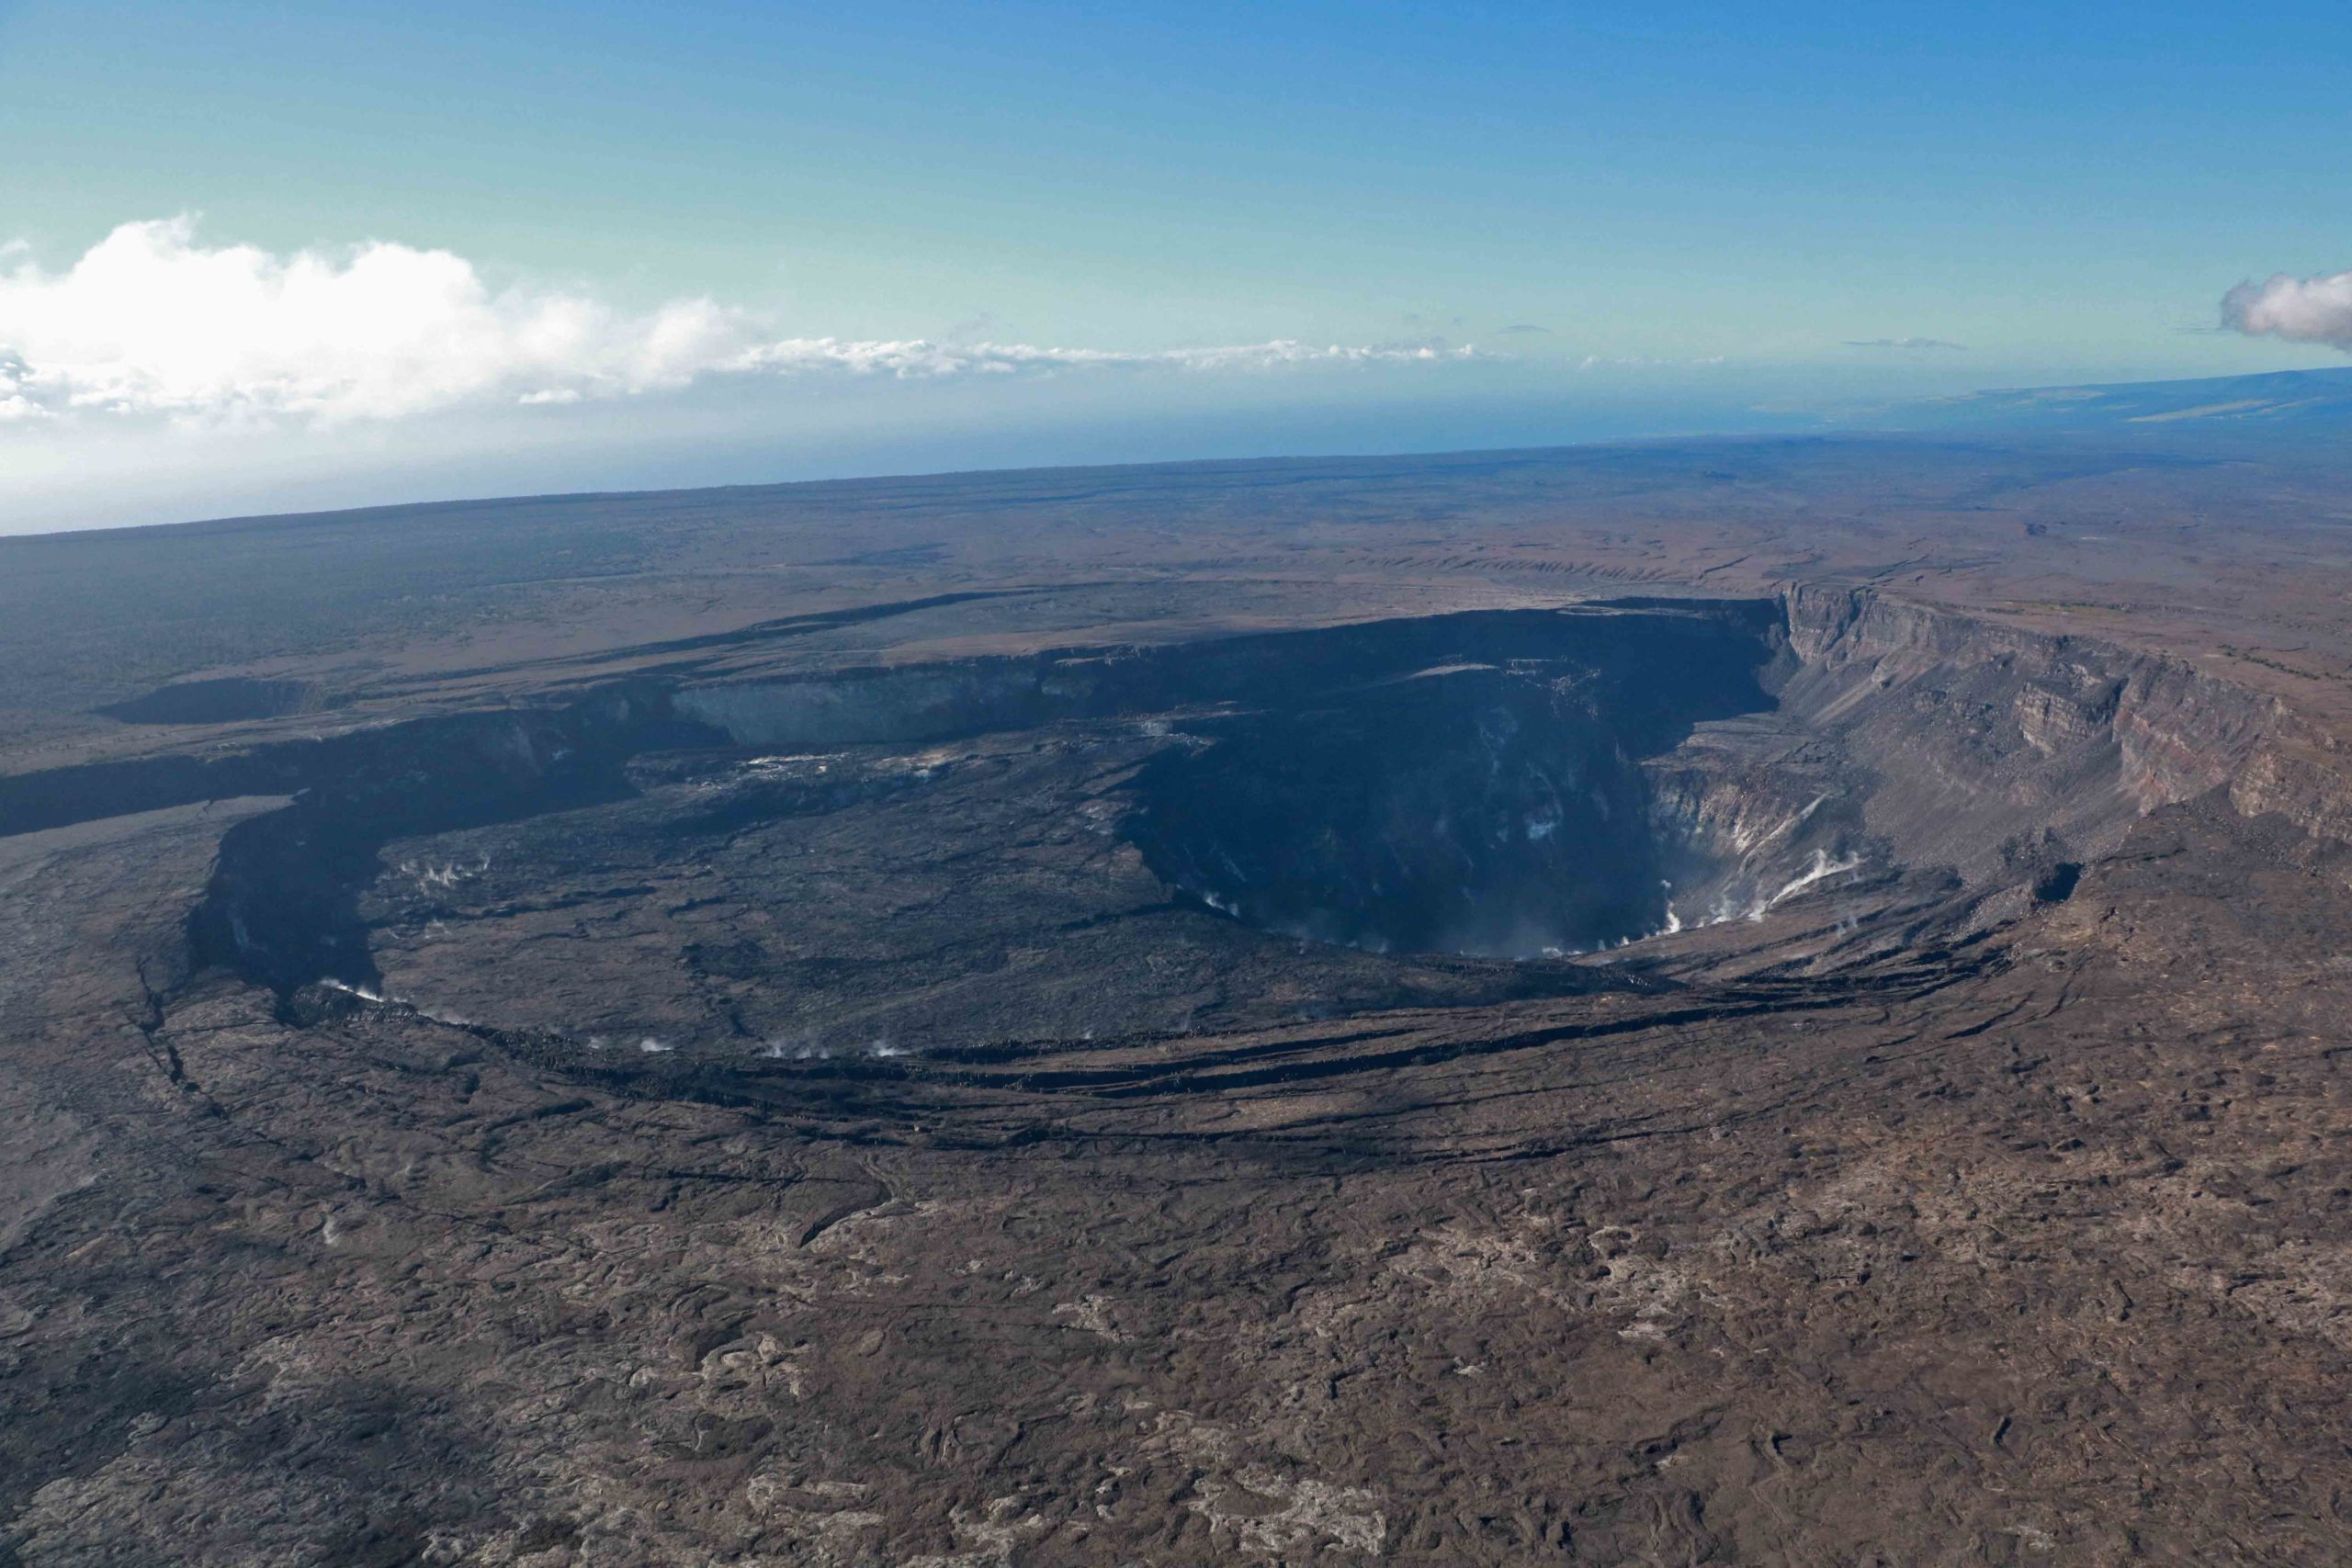 January 10, 2020. EN. Mexico : Popocatepetl , Hawaii : Kilauea , Alaska : Semisopochnoi , El Salvador : Santa Ana (Llamatepec) / San Miguel (Chaparrastique) .